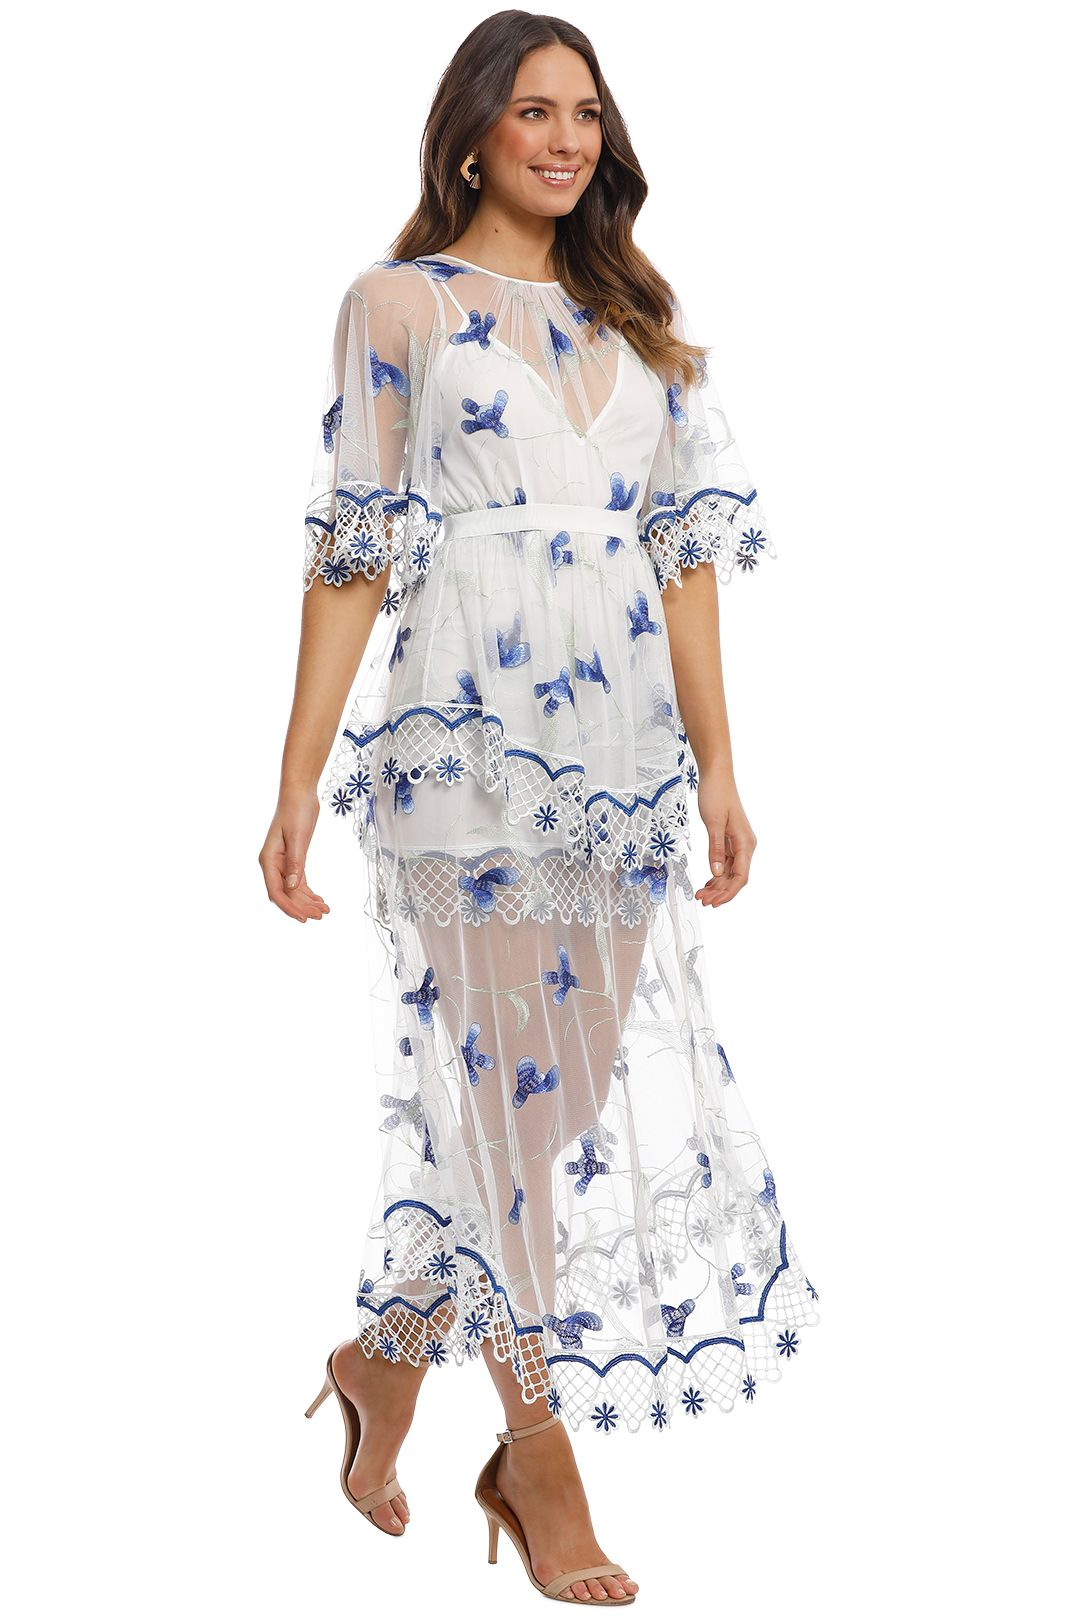 Alice McCall - Marigold Dress - Porcelain Sugarplum - Side